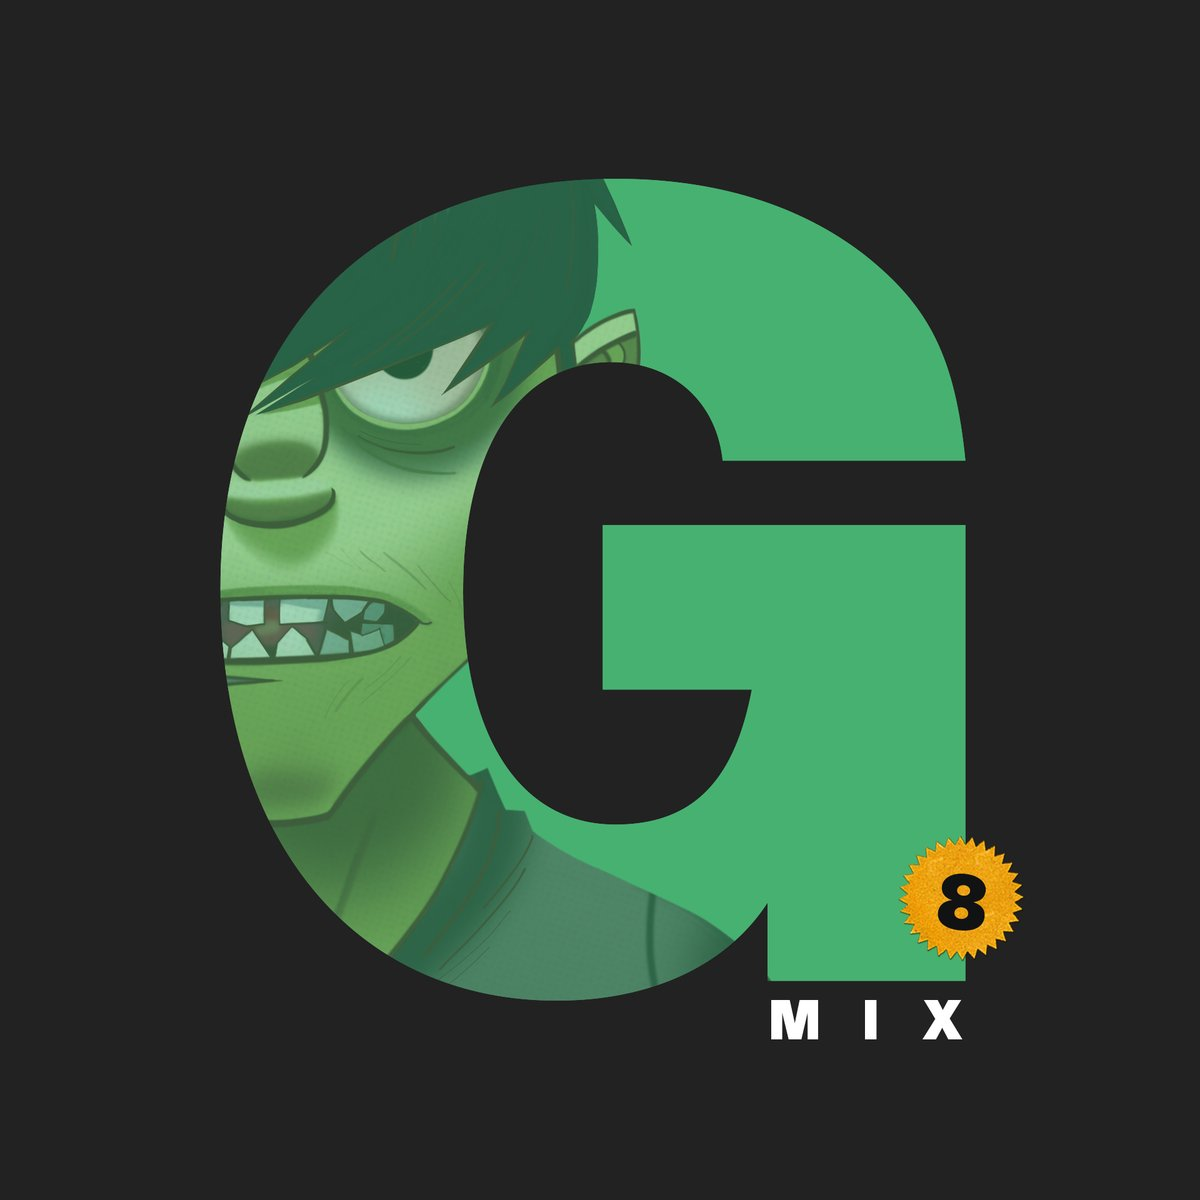 G-Mix: Murdoc 8